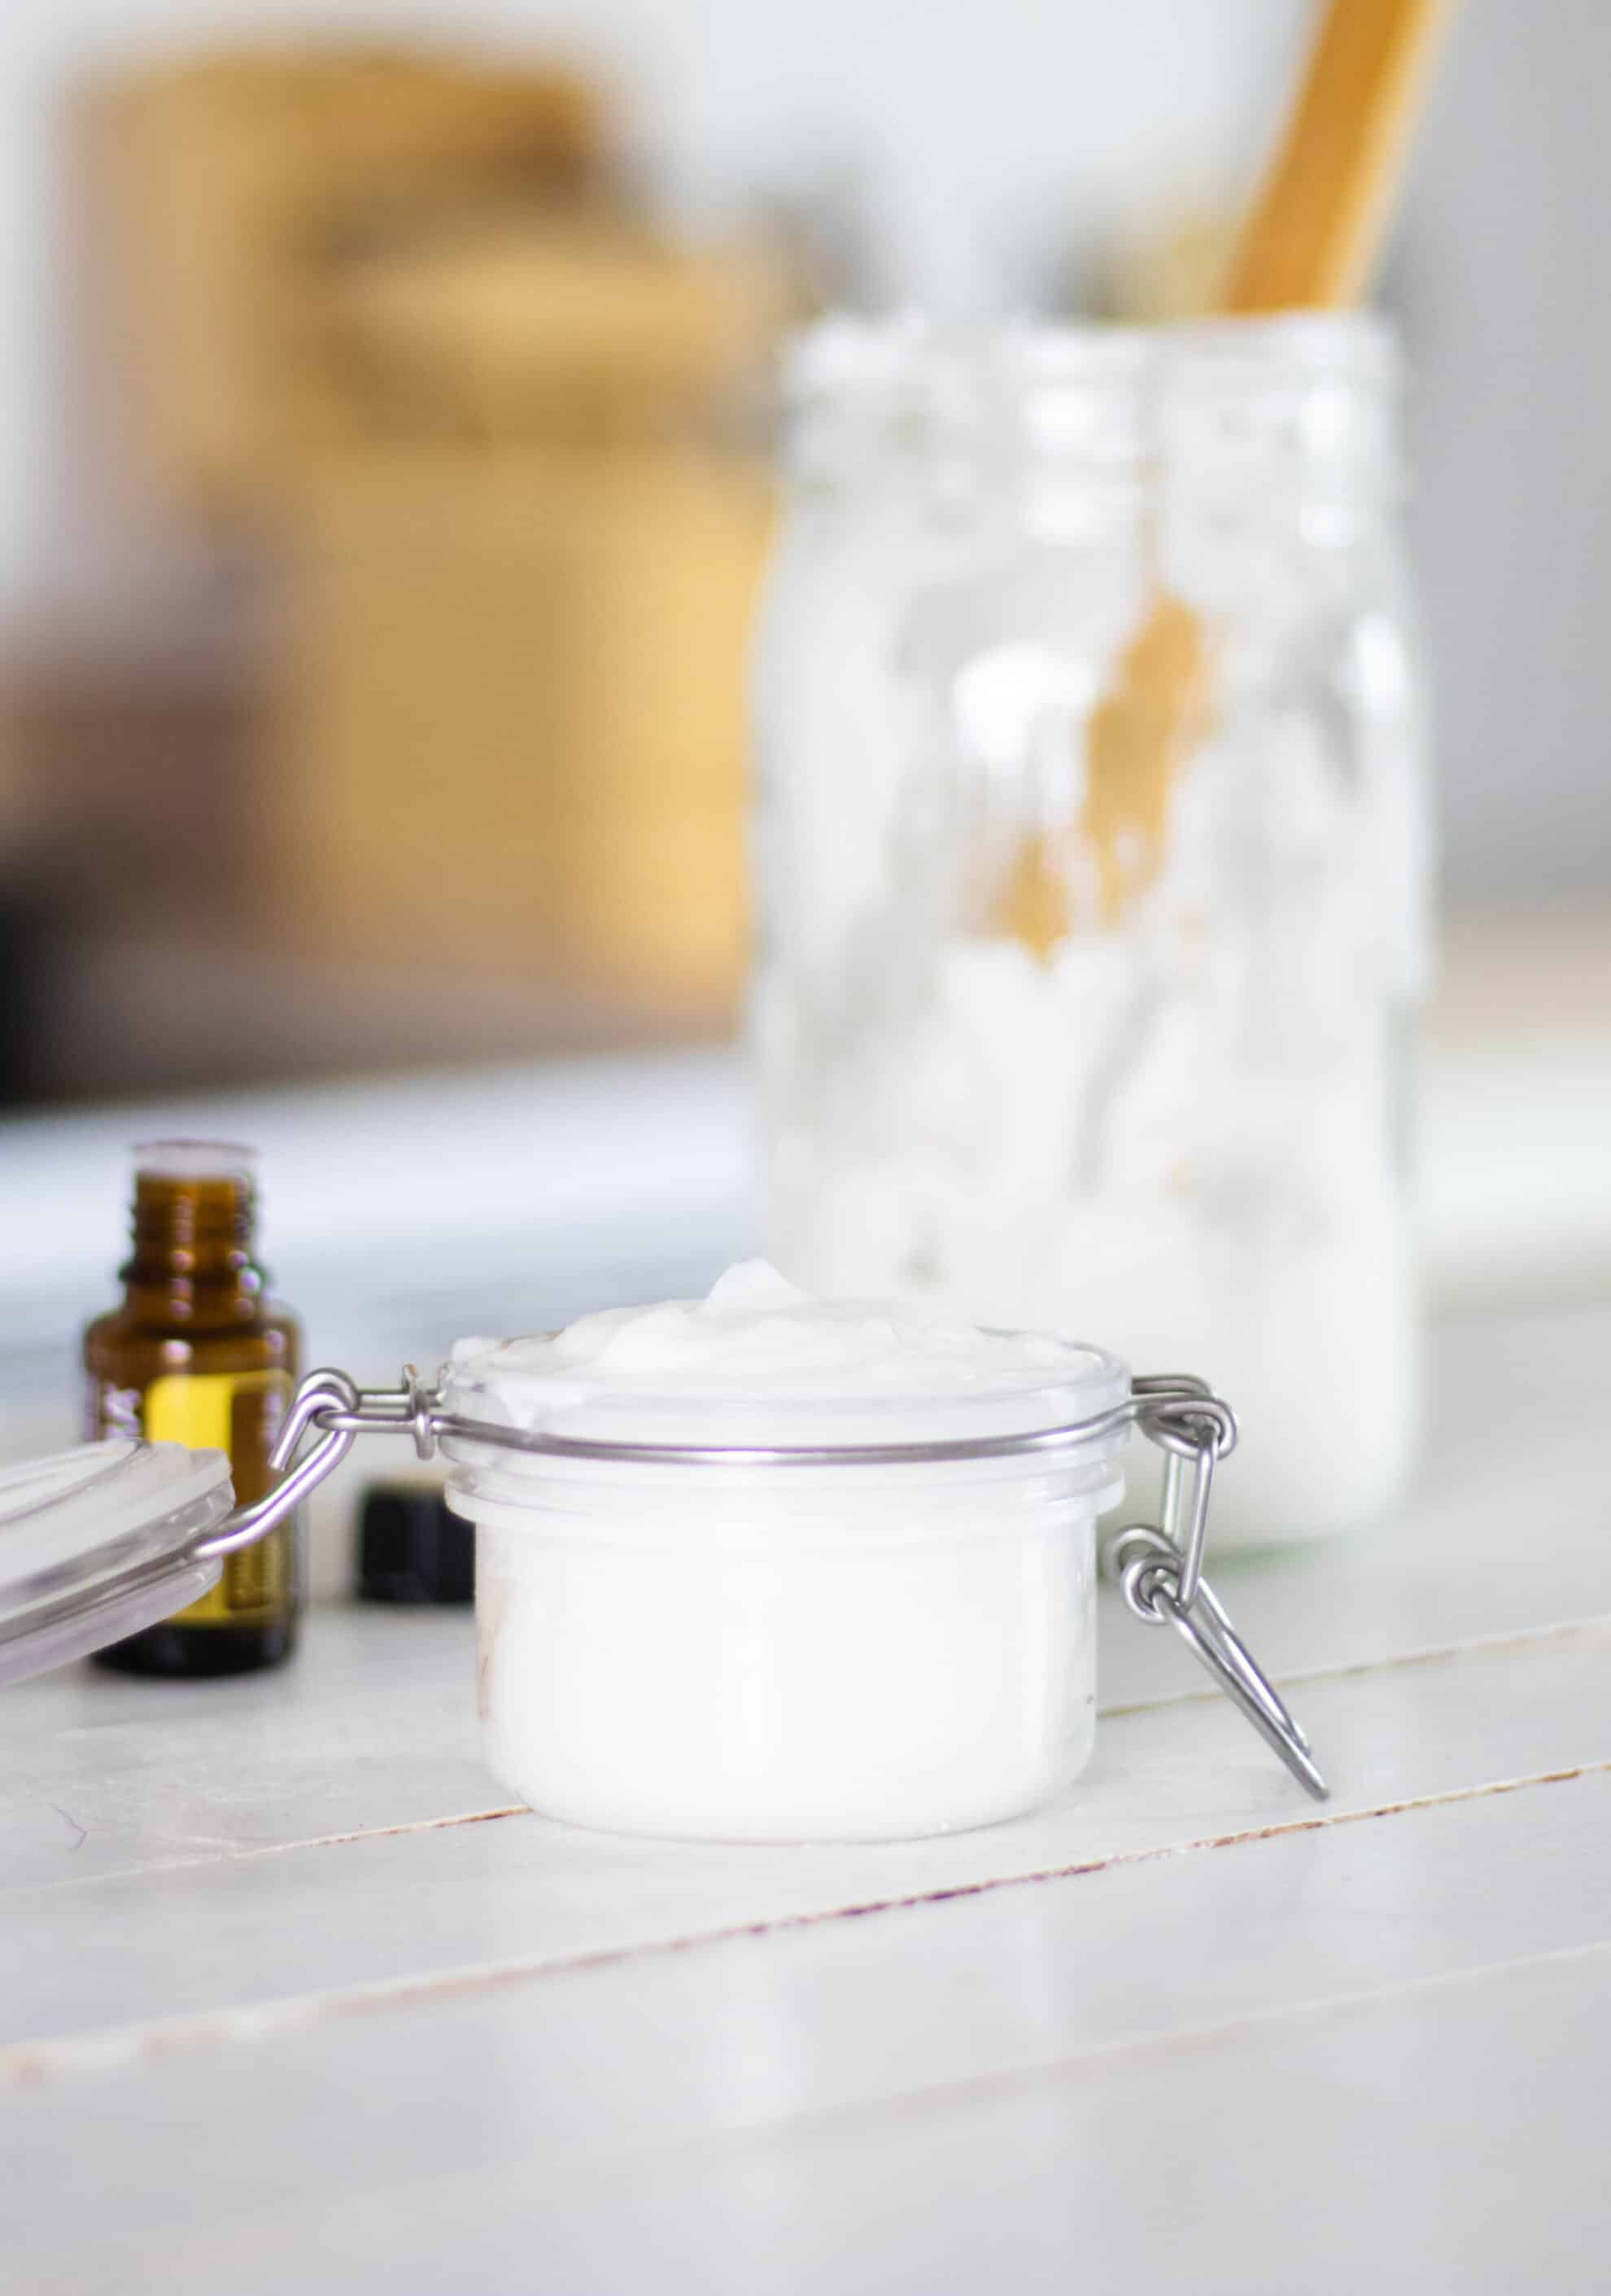 white shower scrub and tub cleaner in mason jar